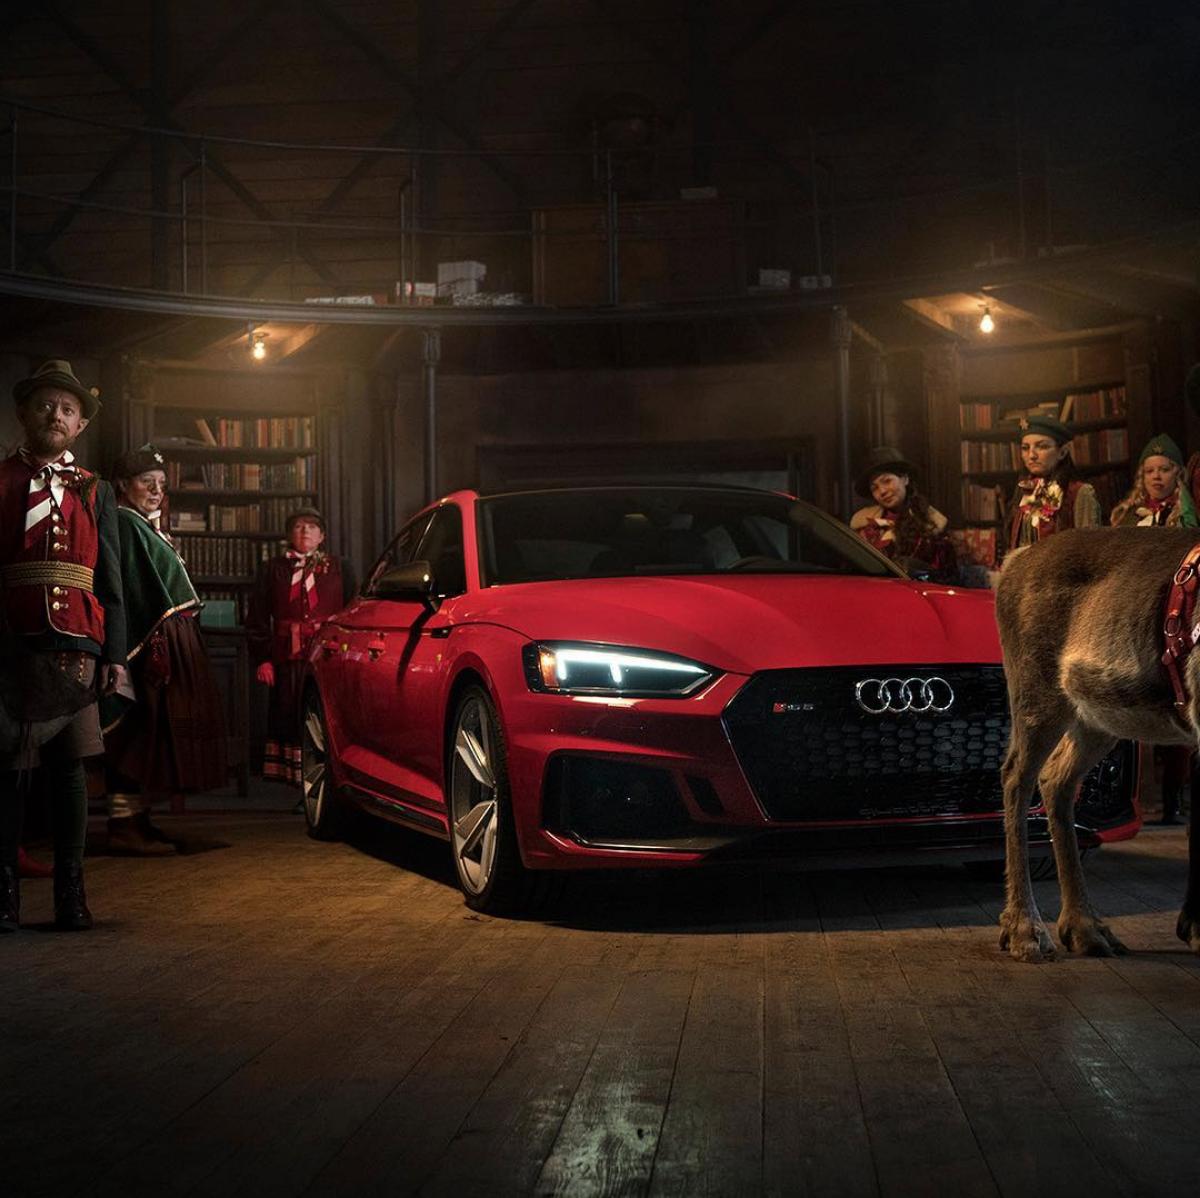 RS 5 Sportback - New Santa